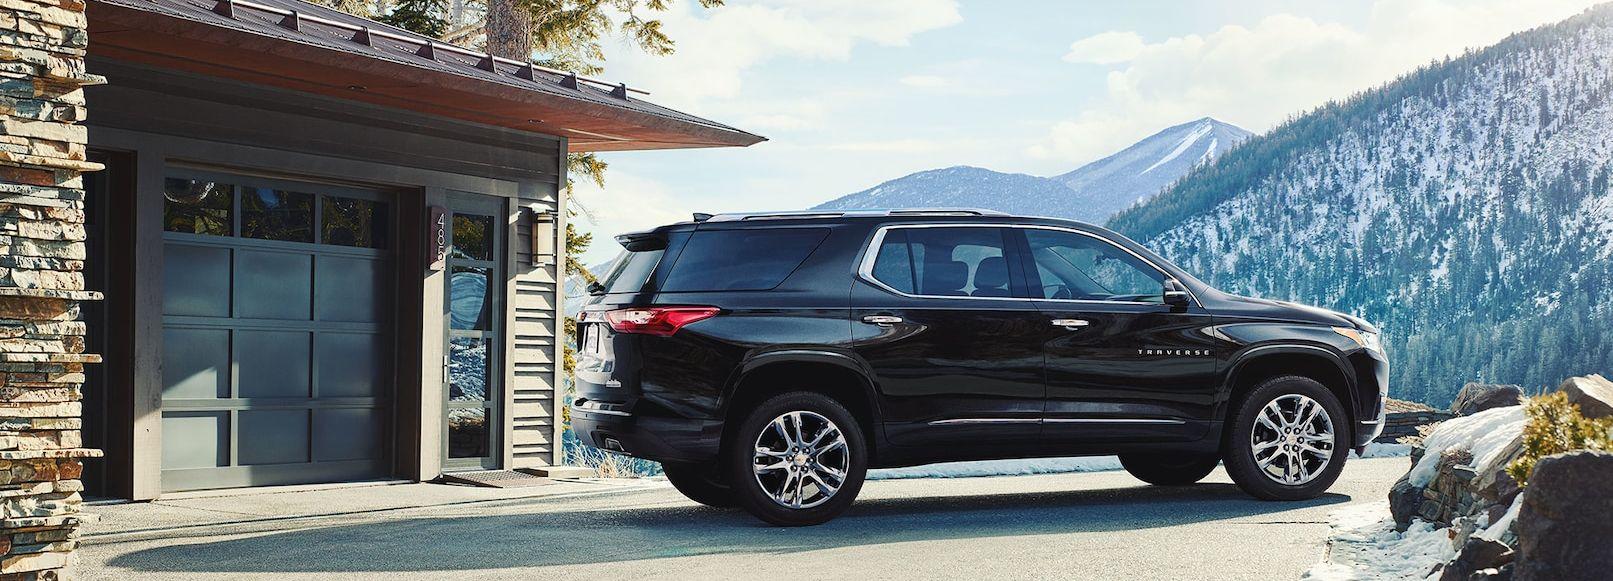 2019 Chevrolet Traverse Financing near Calumet City, IL